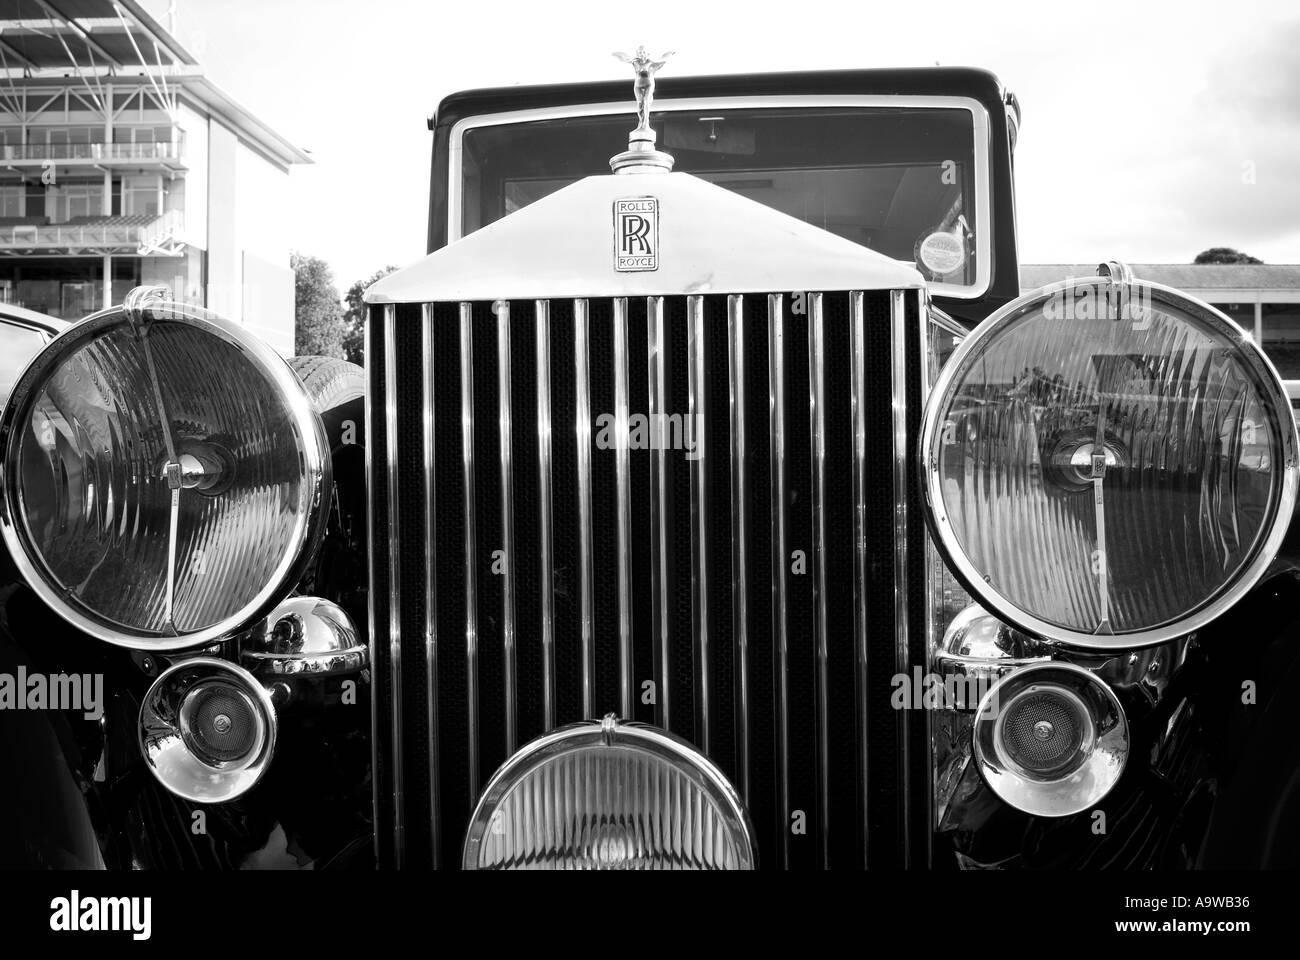 Rolls Royce Radiator Stock Photos & Rolls Royce Radiator